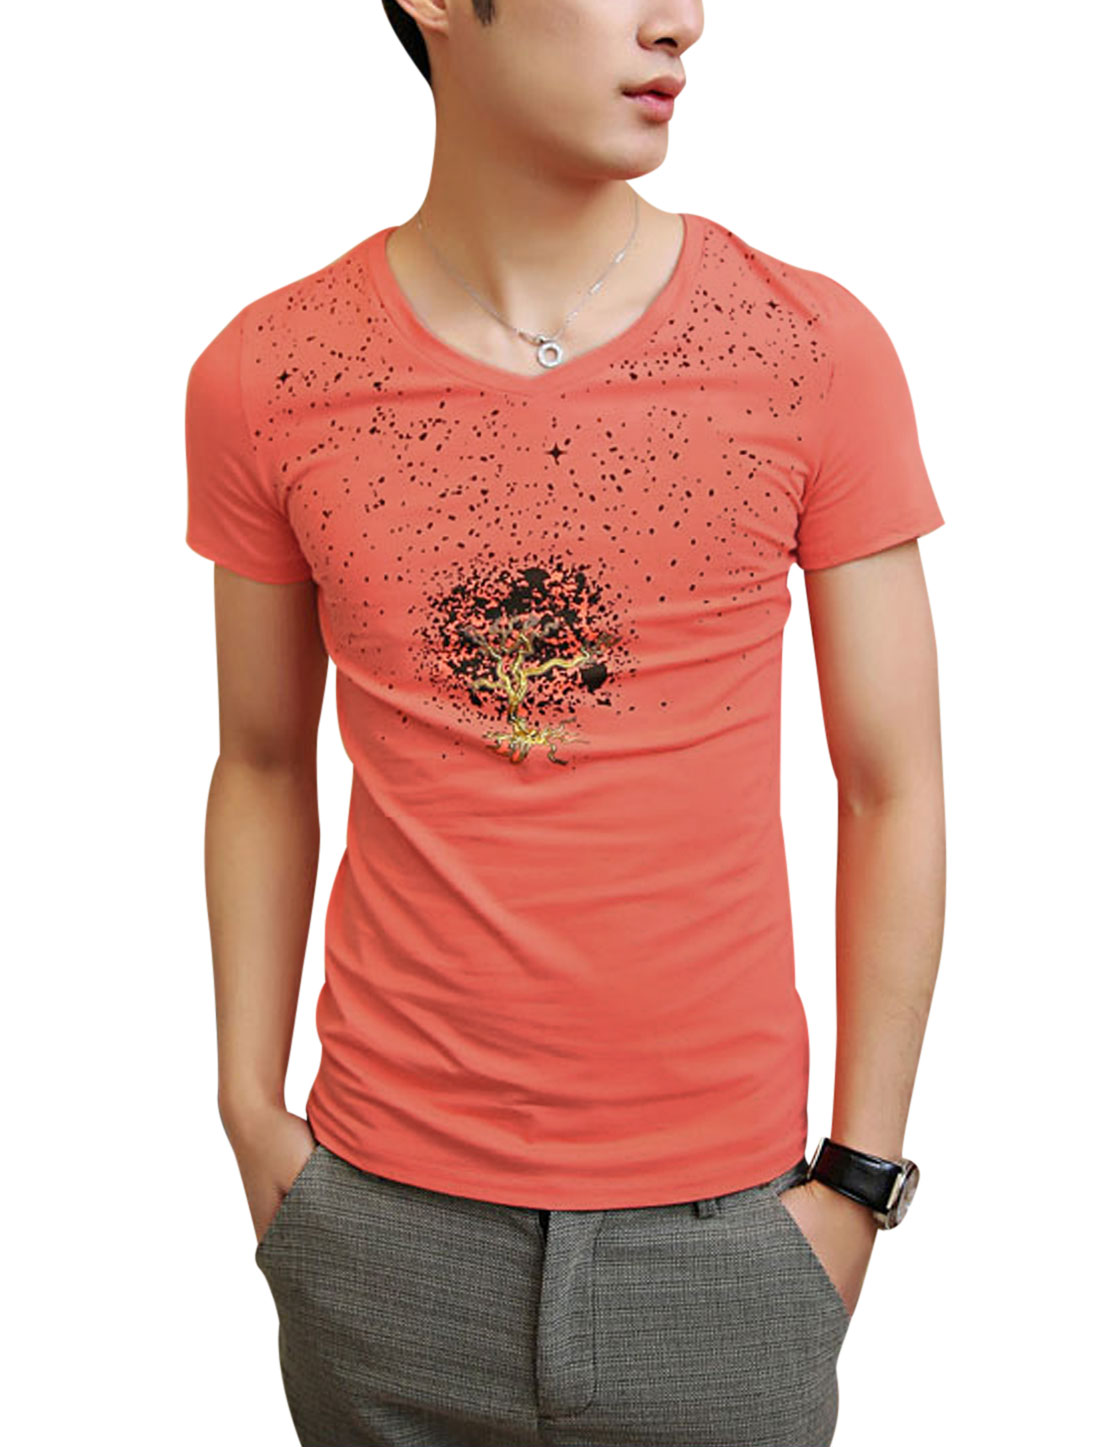 Men Fashion V Neck Glitter Detail Tree Printed Tee Watermelon Red S